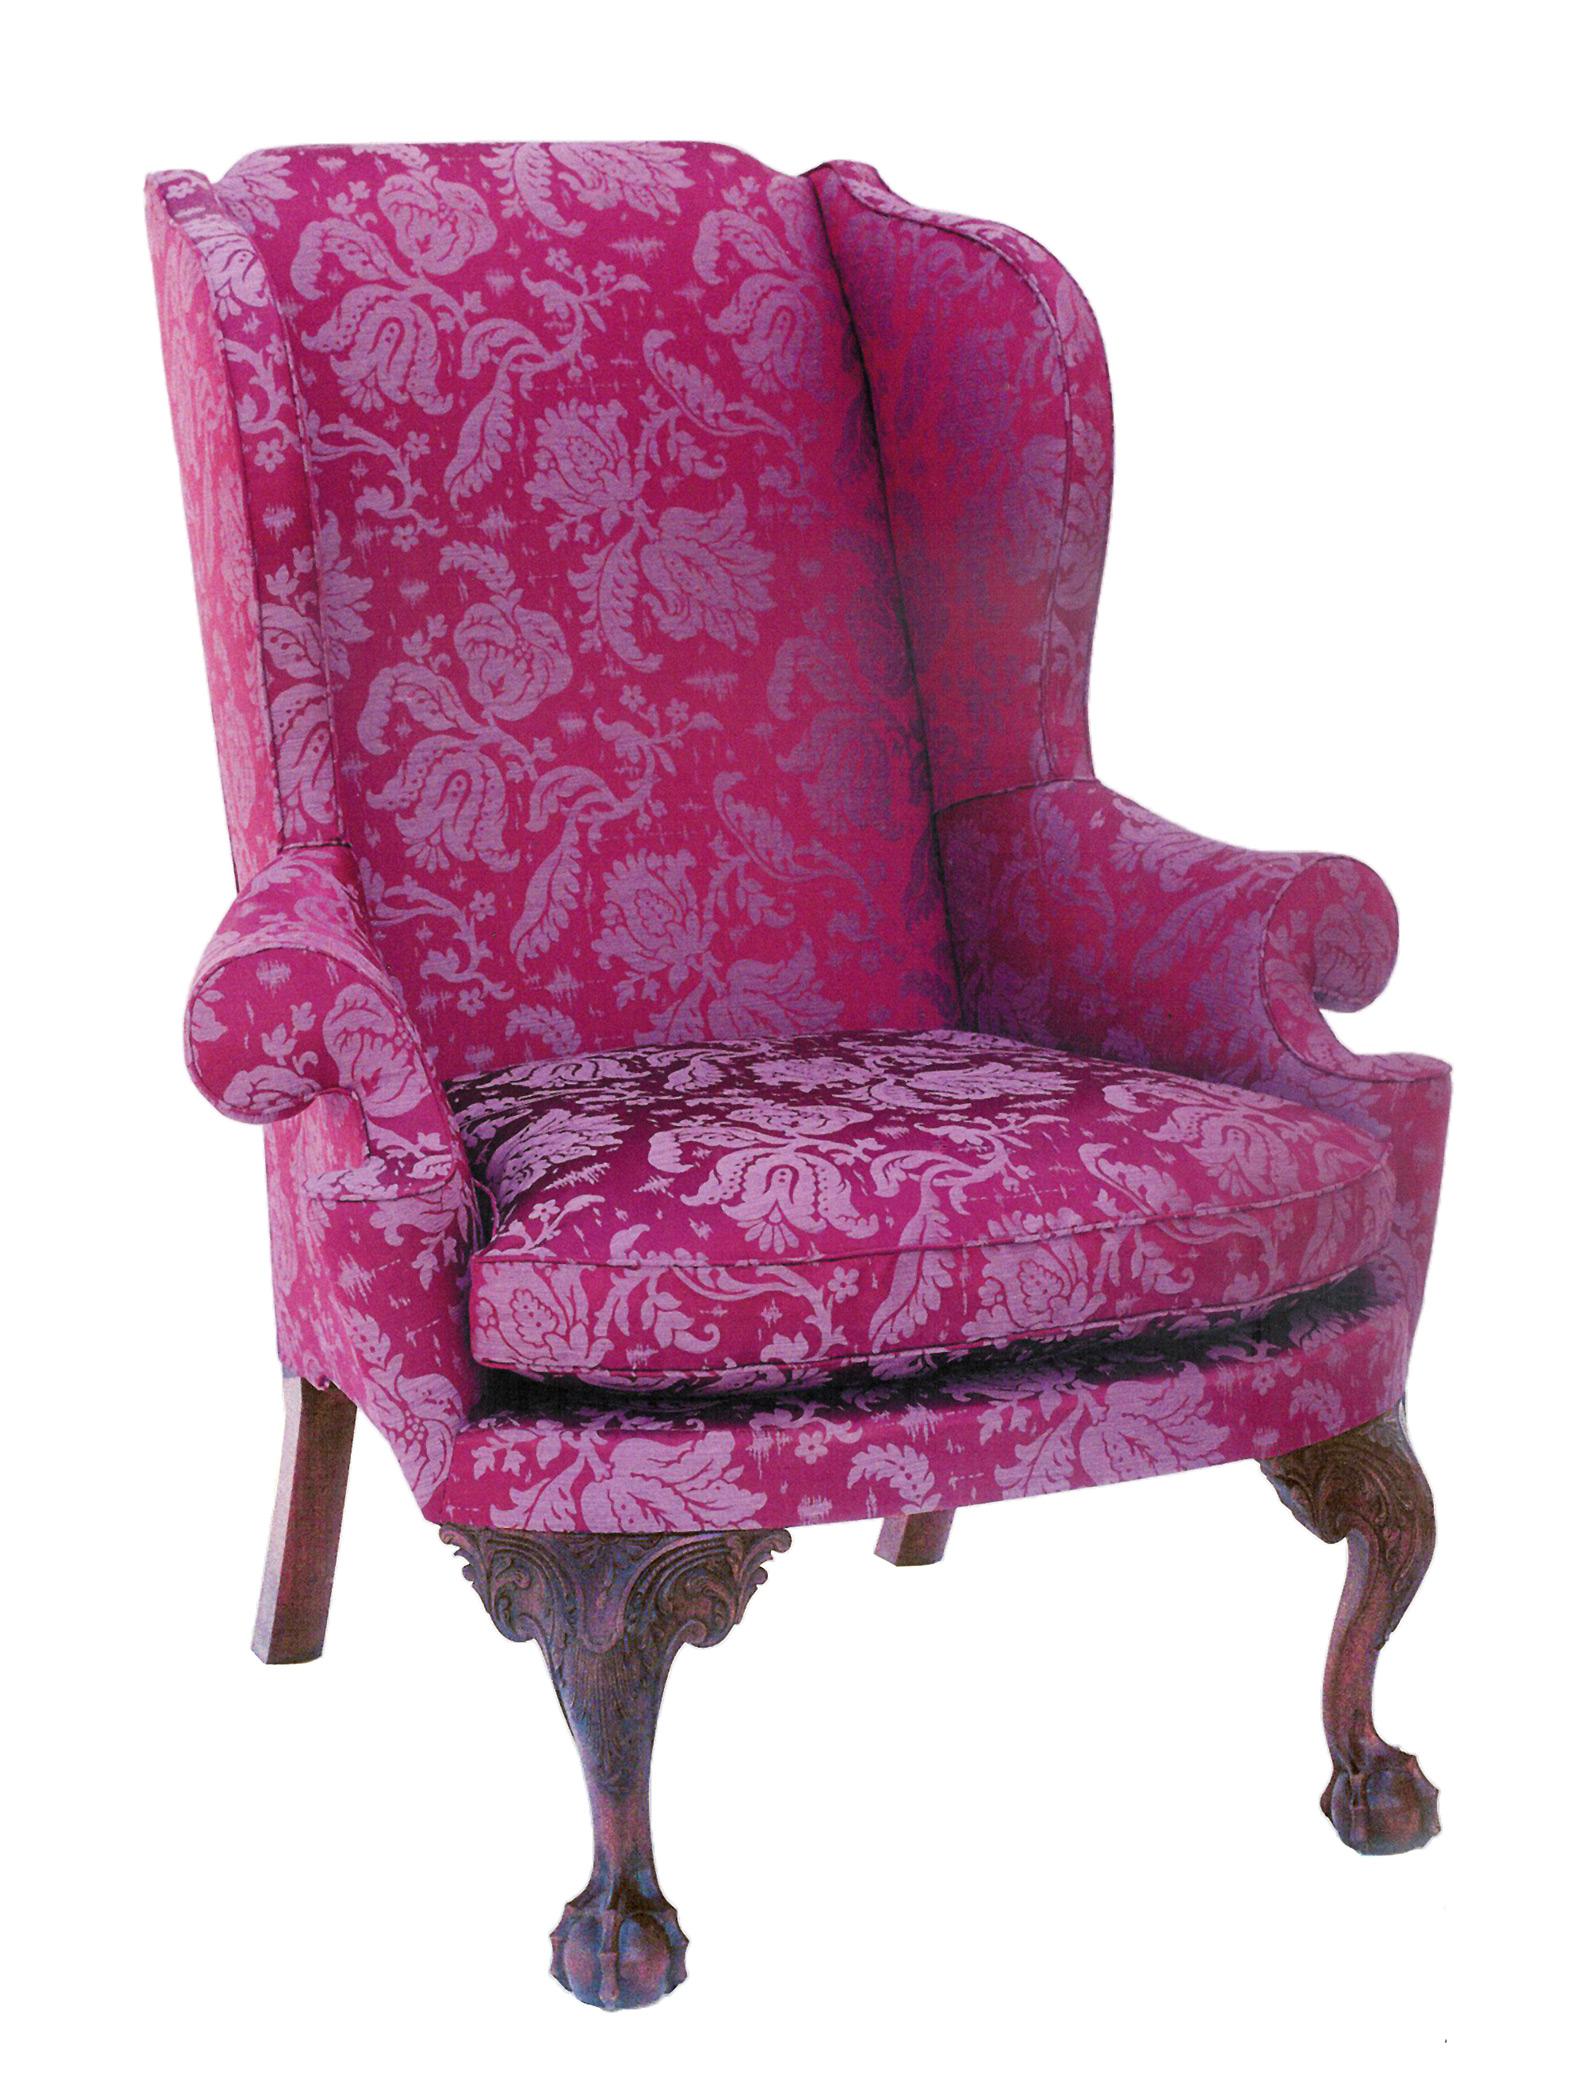 Philadelphia Chippendale Easy Chair